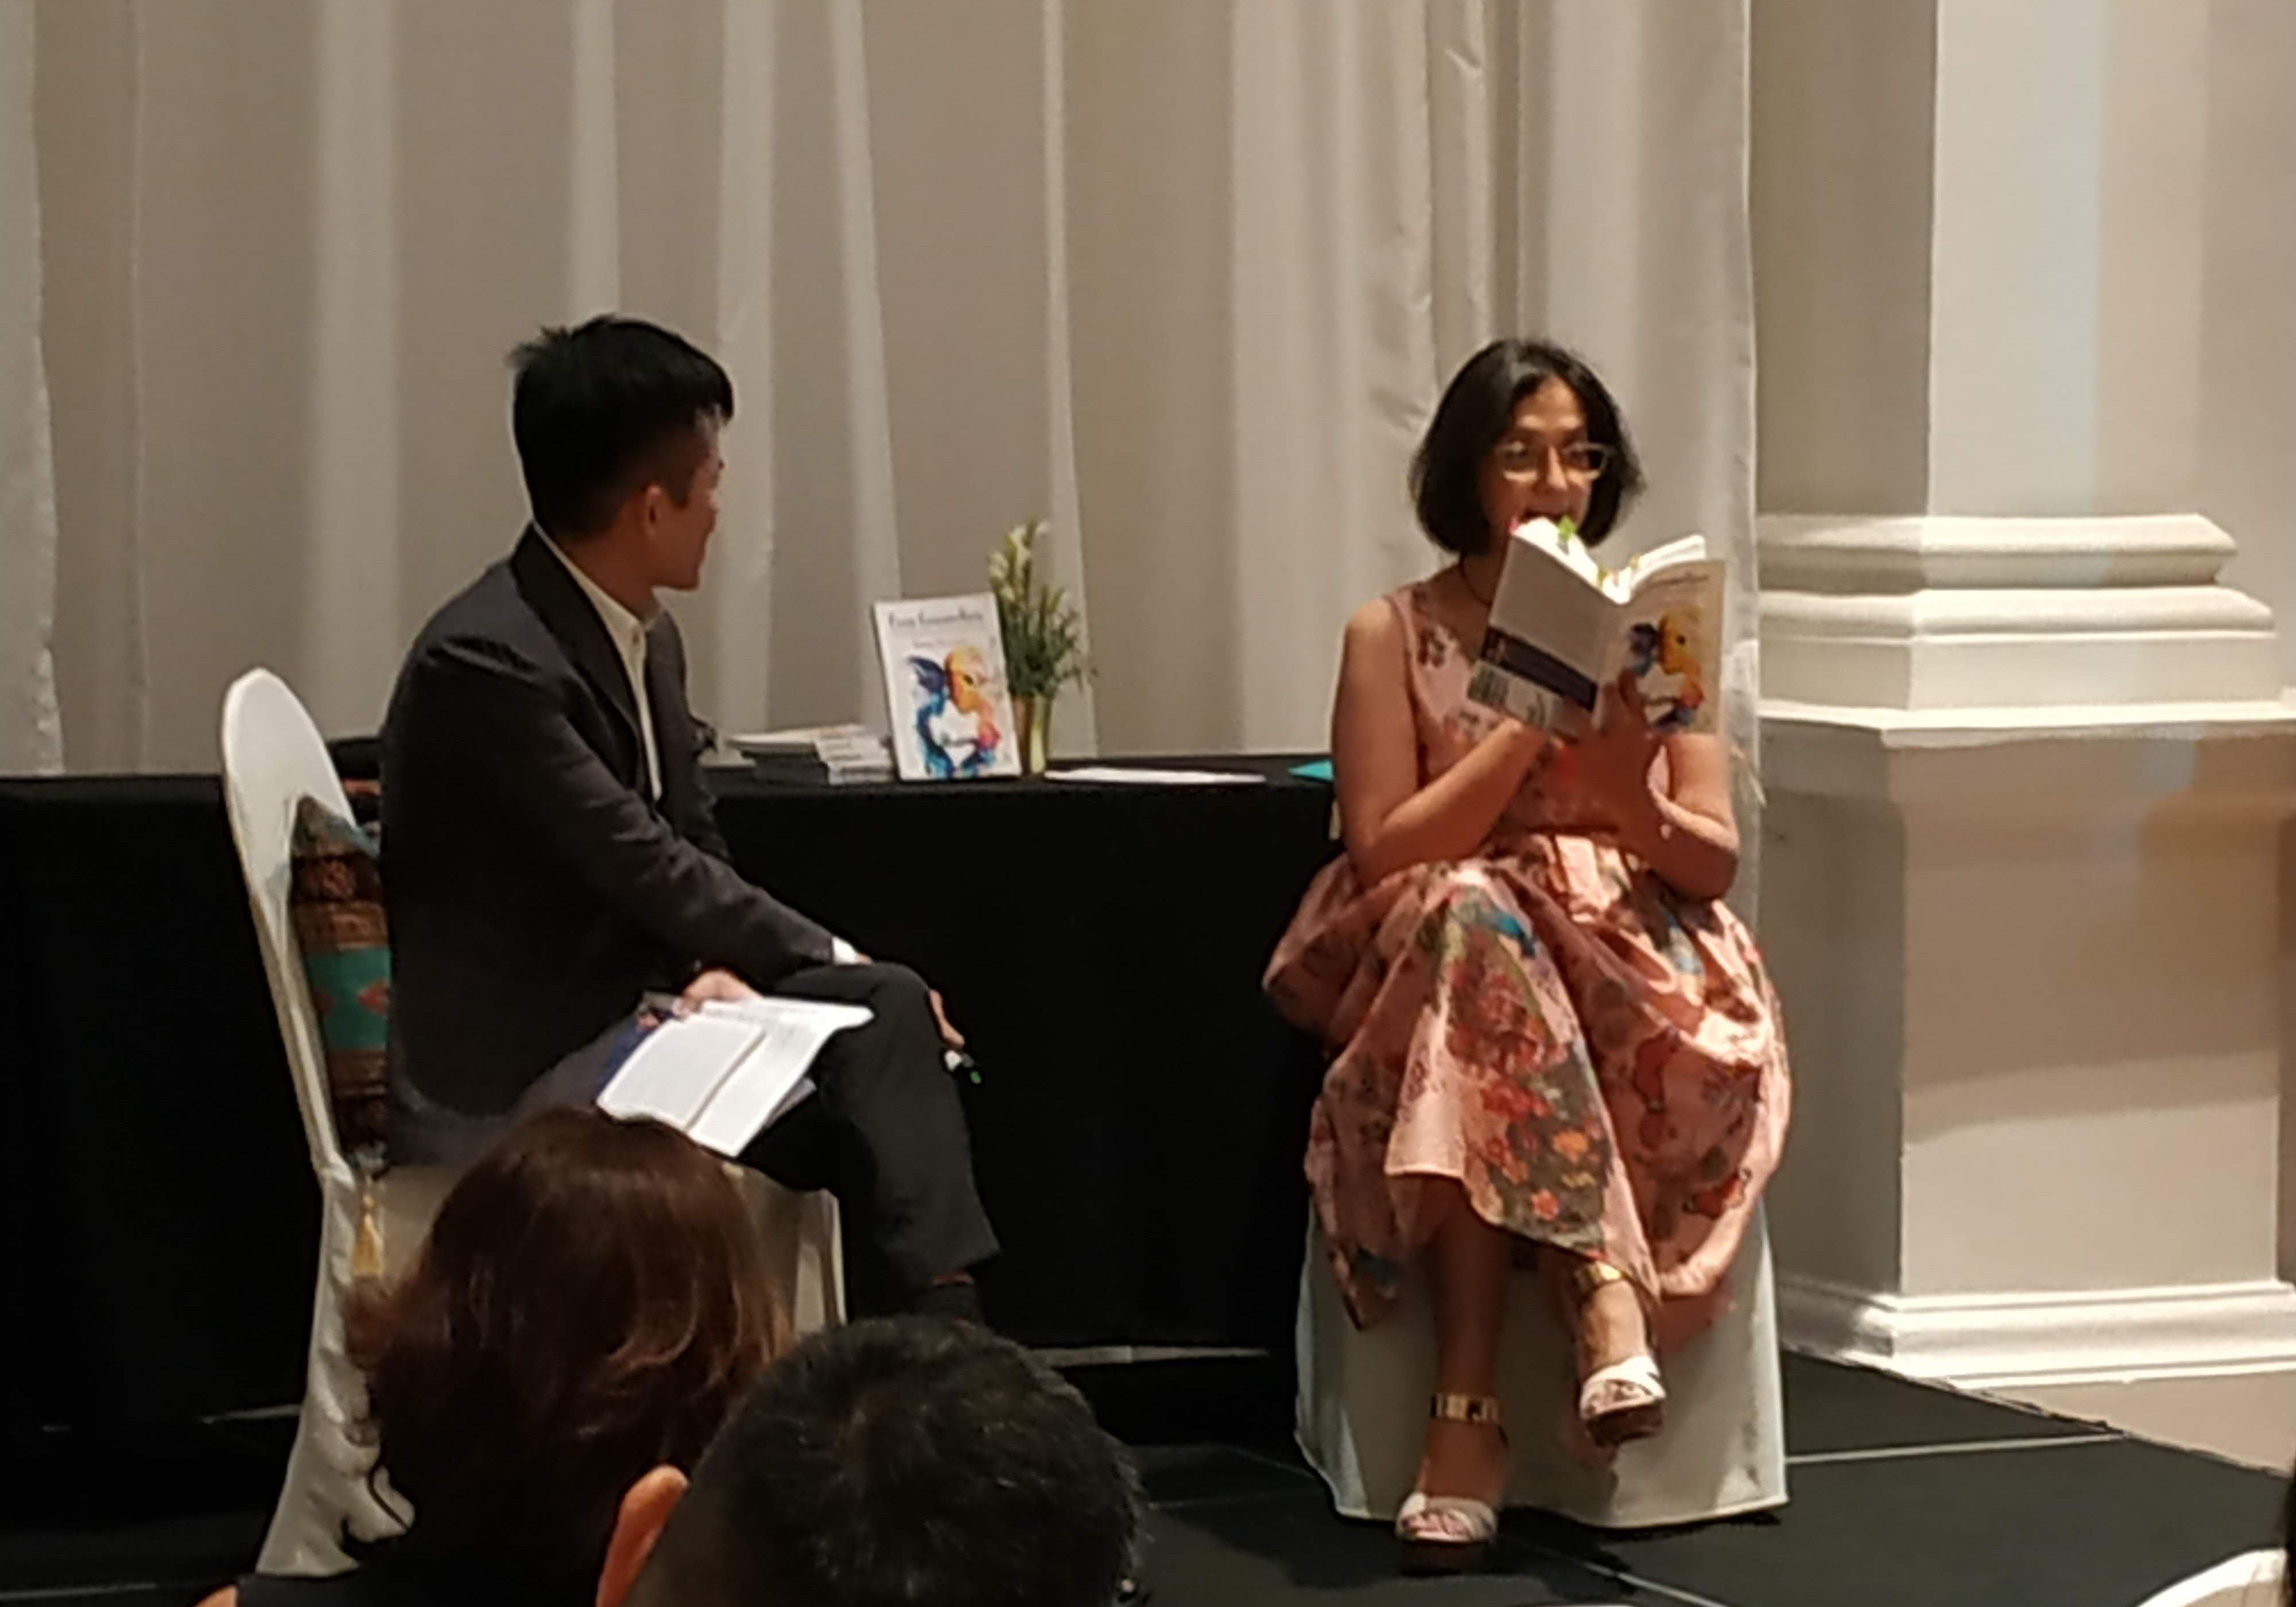 Seema Punwani reading from her book